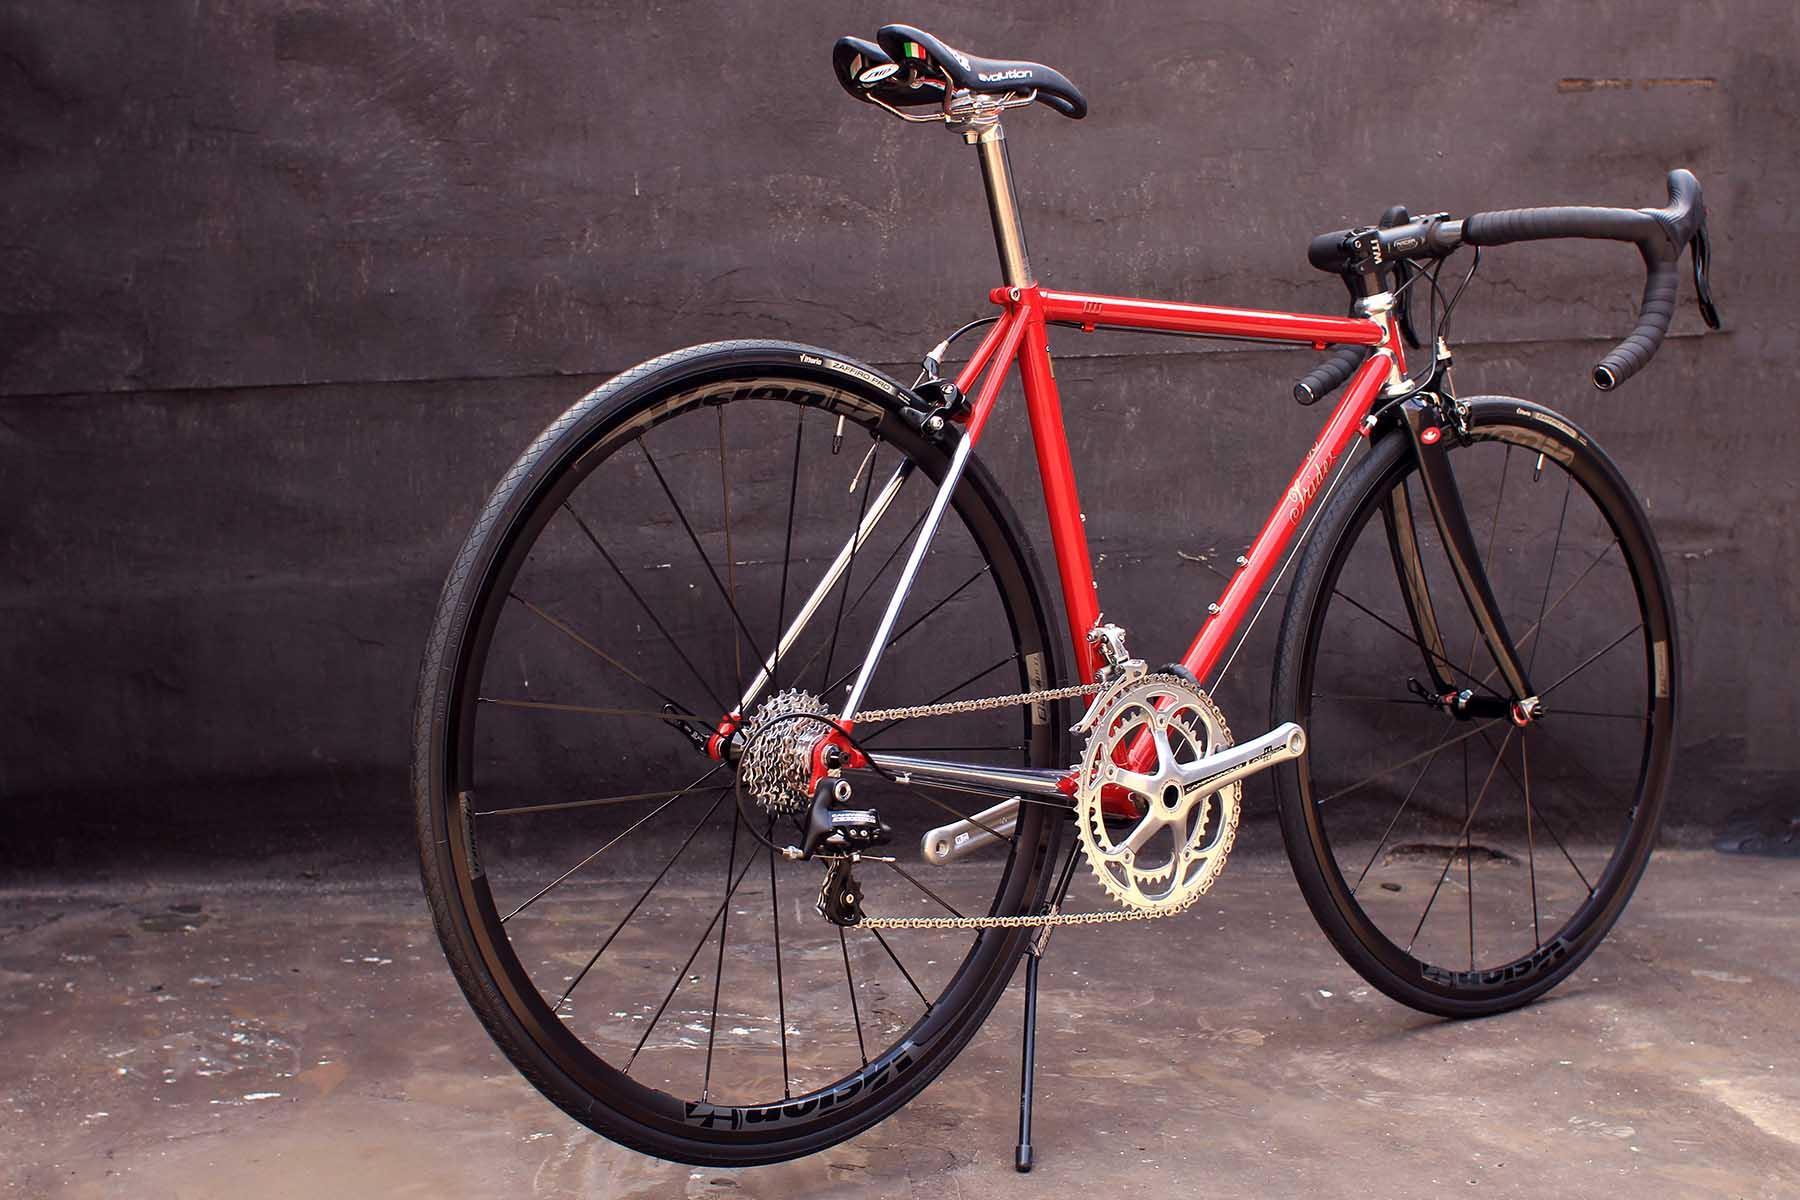 Nucleo The New Iride Road Bike 20 Speed Racing Bicycle